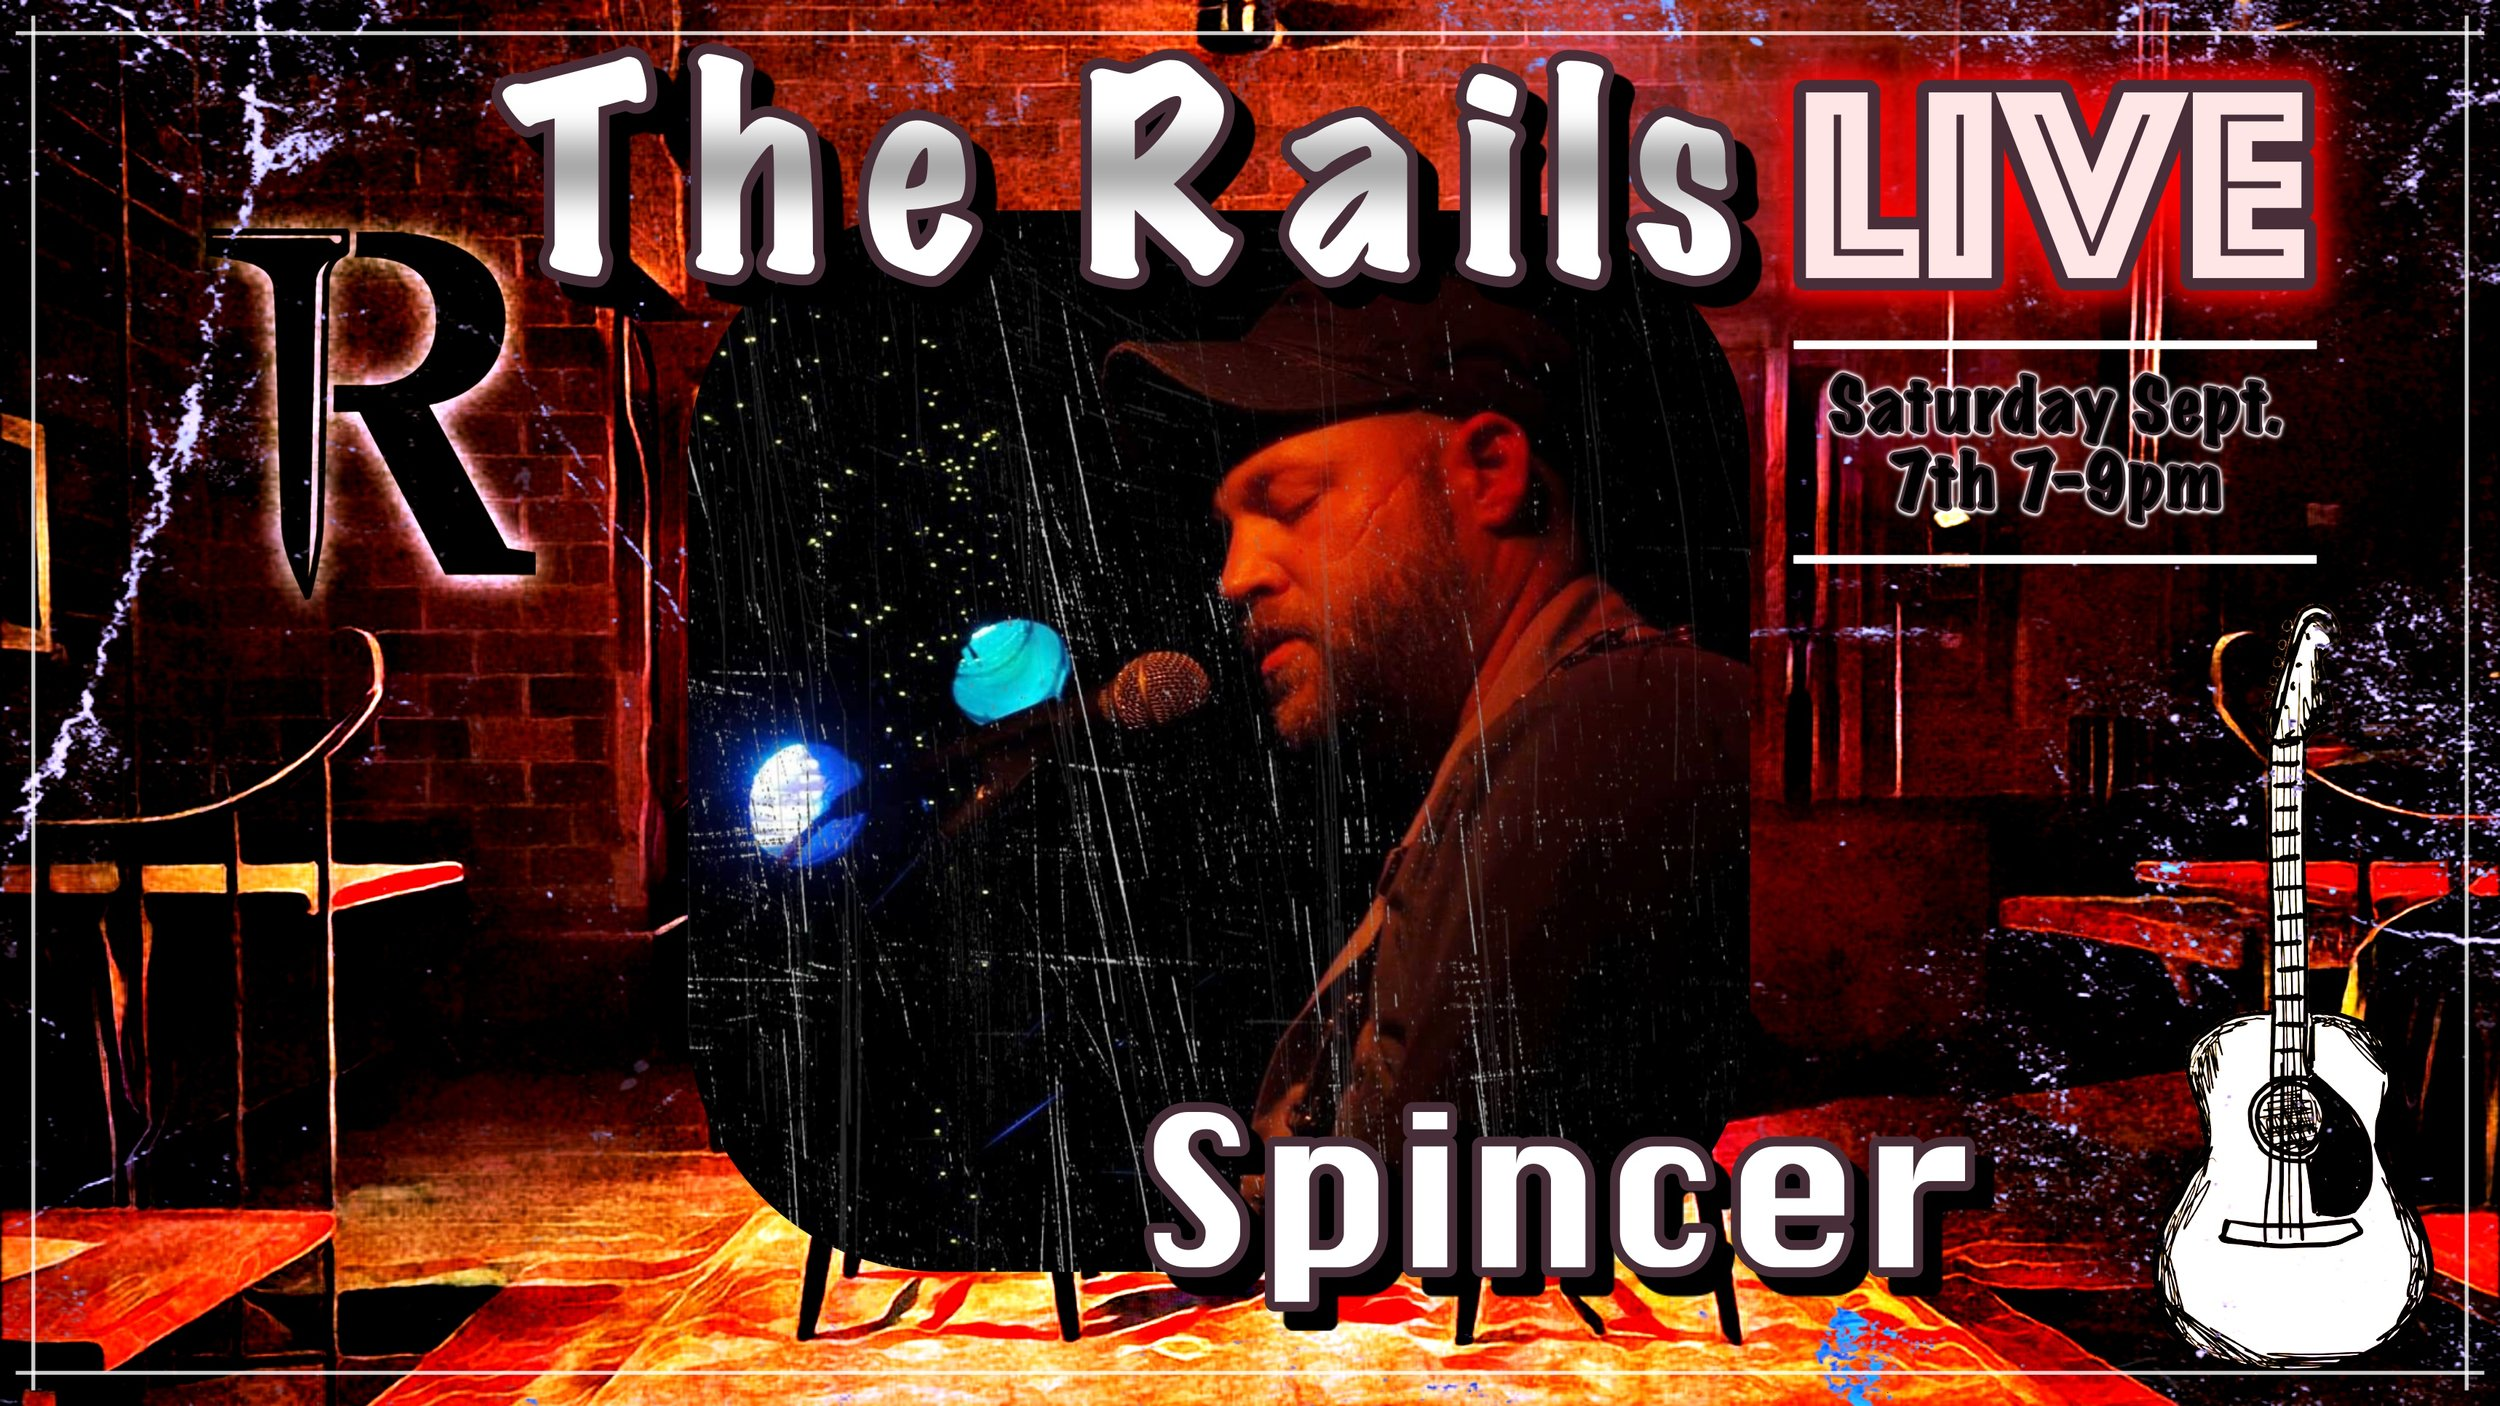 Live Music Spincer.jpg